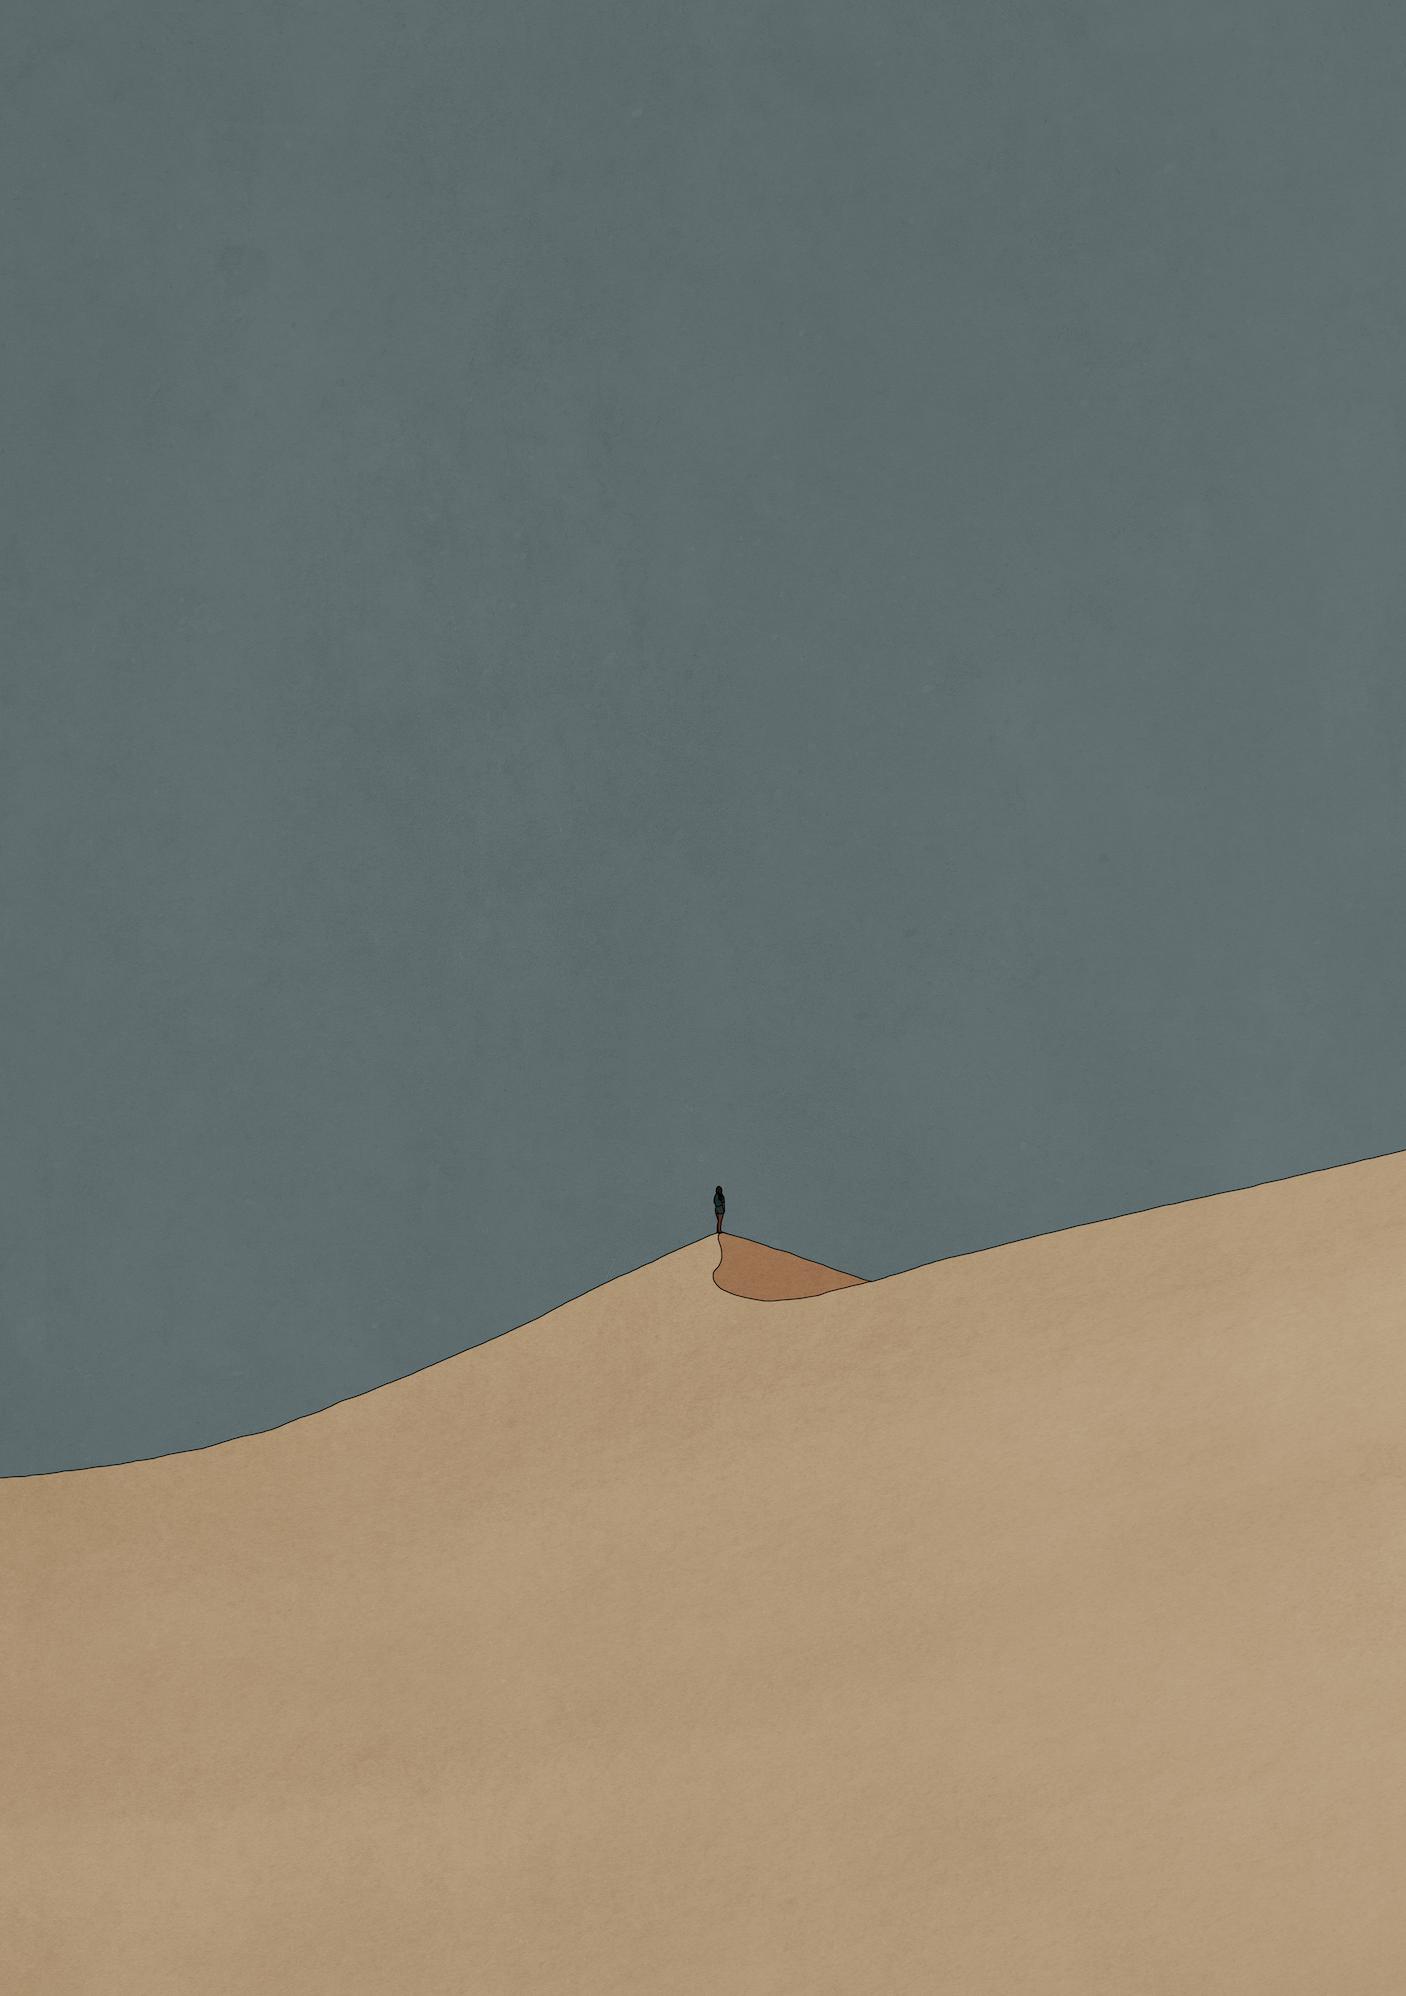 Sand Dunes Illustration